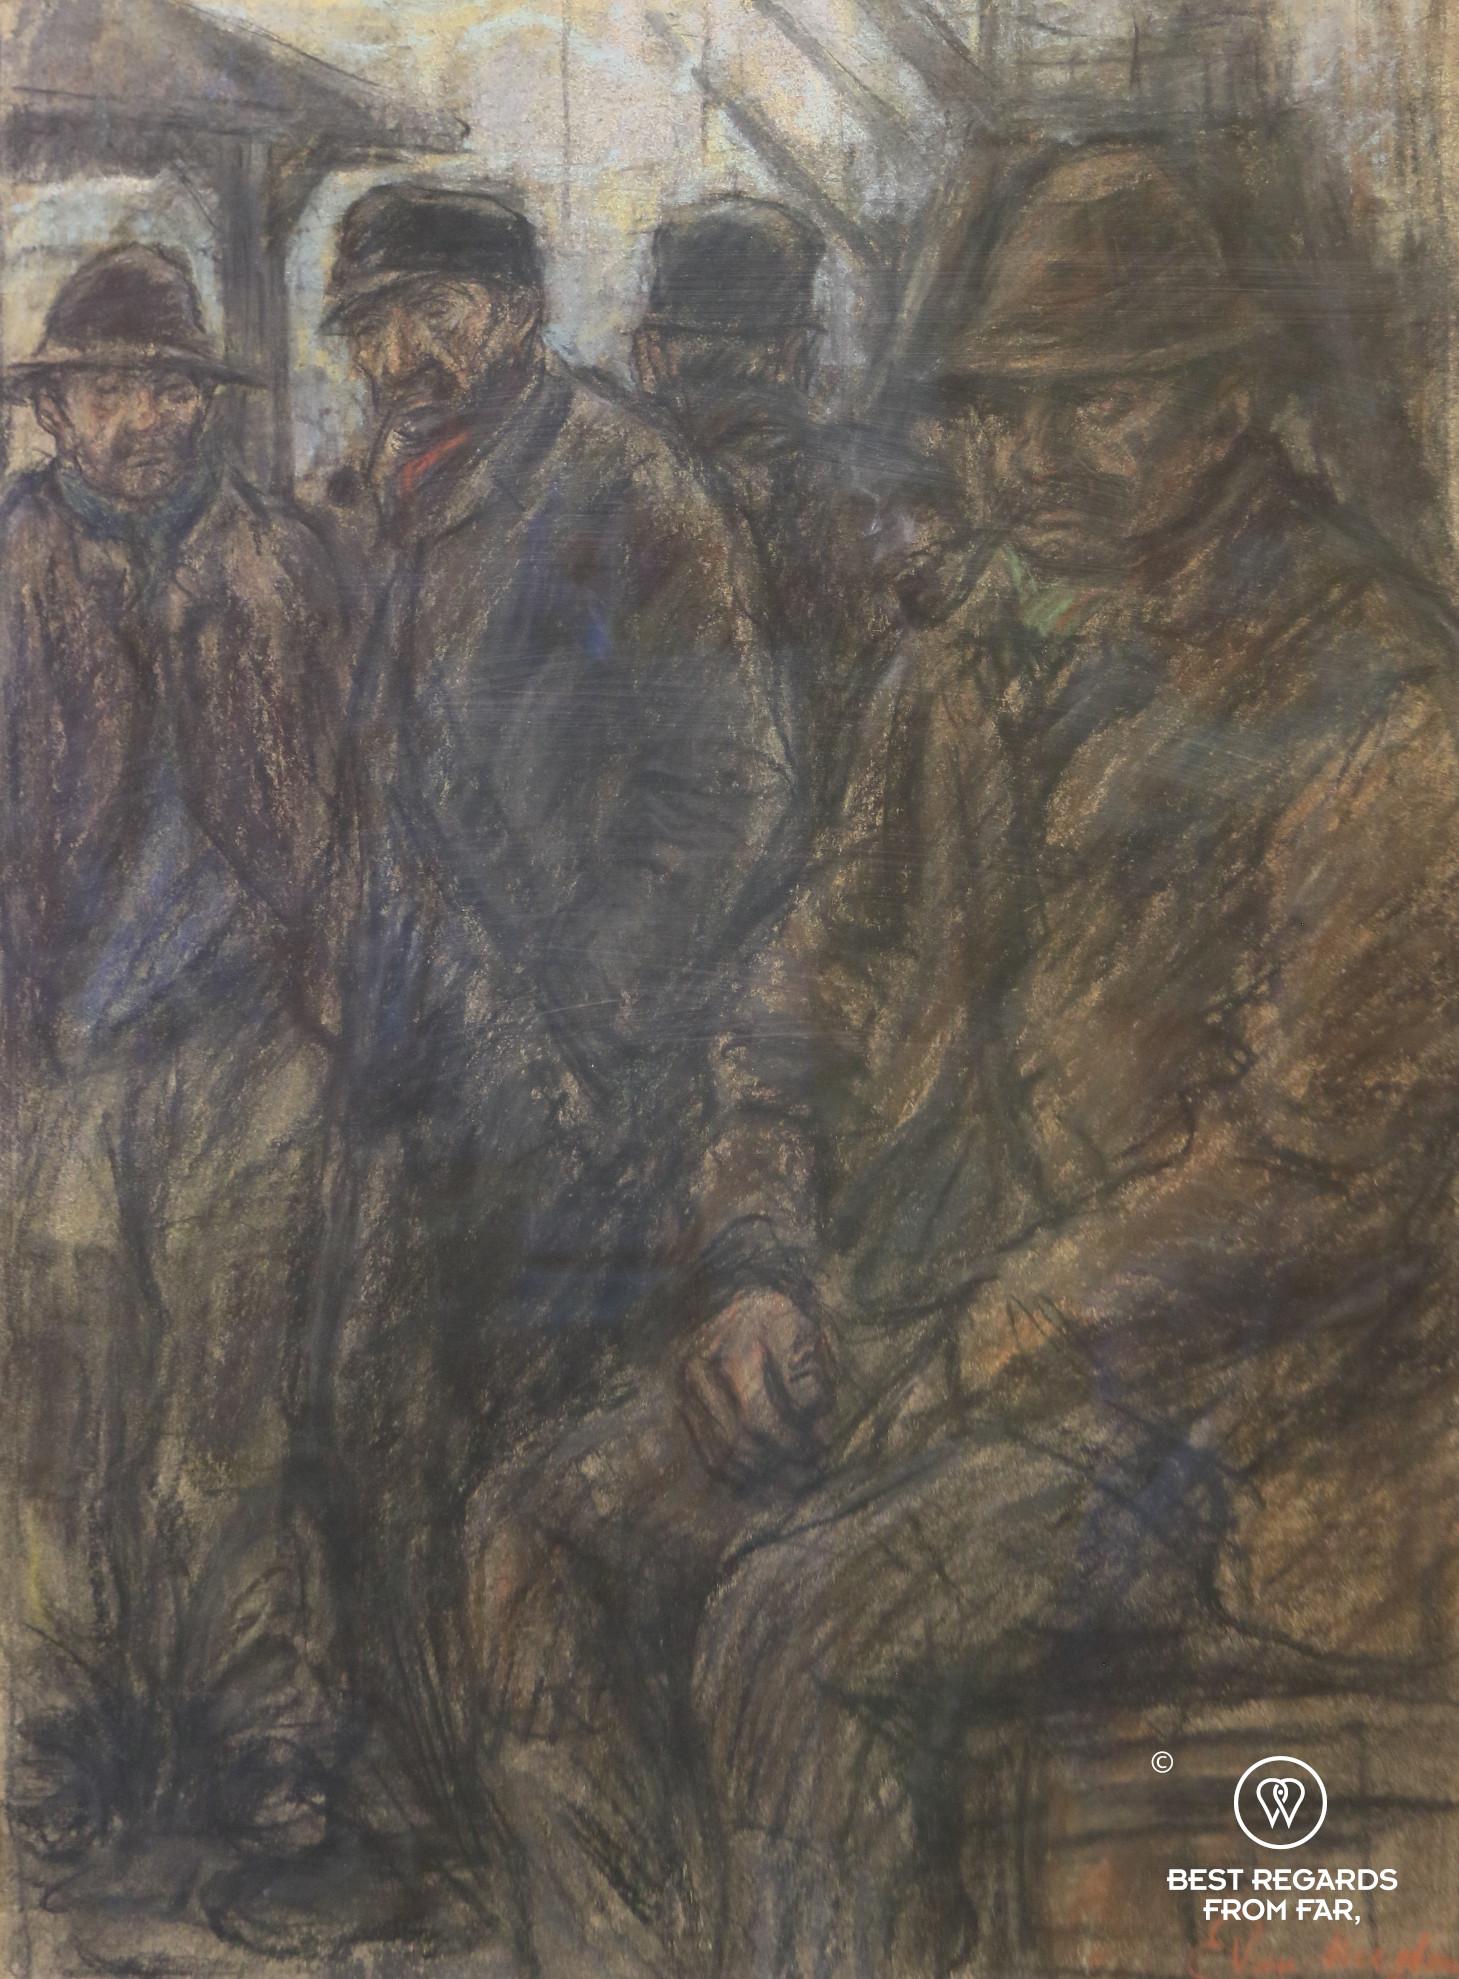 Hardship on the harbour of Antwerp by painter Eugeen van Mieghem, Eugeen van Mieghem museum